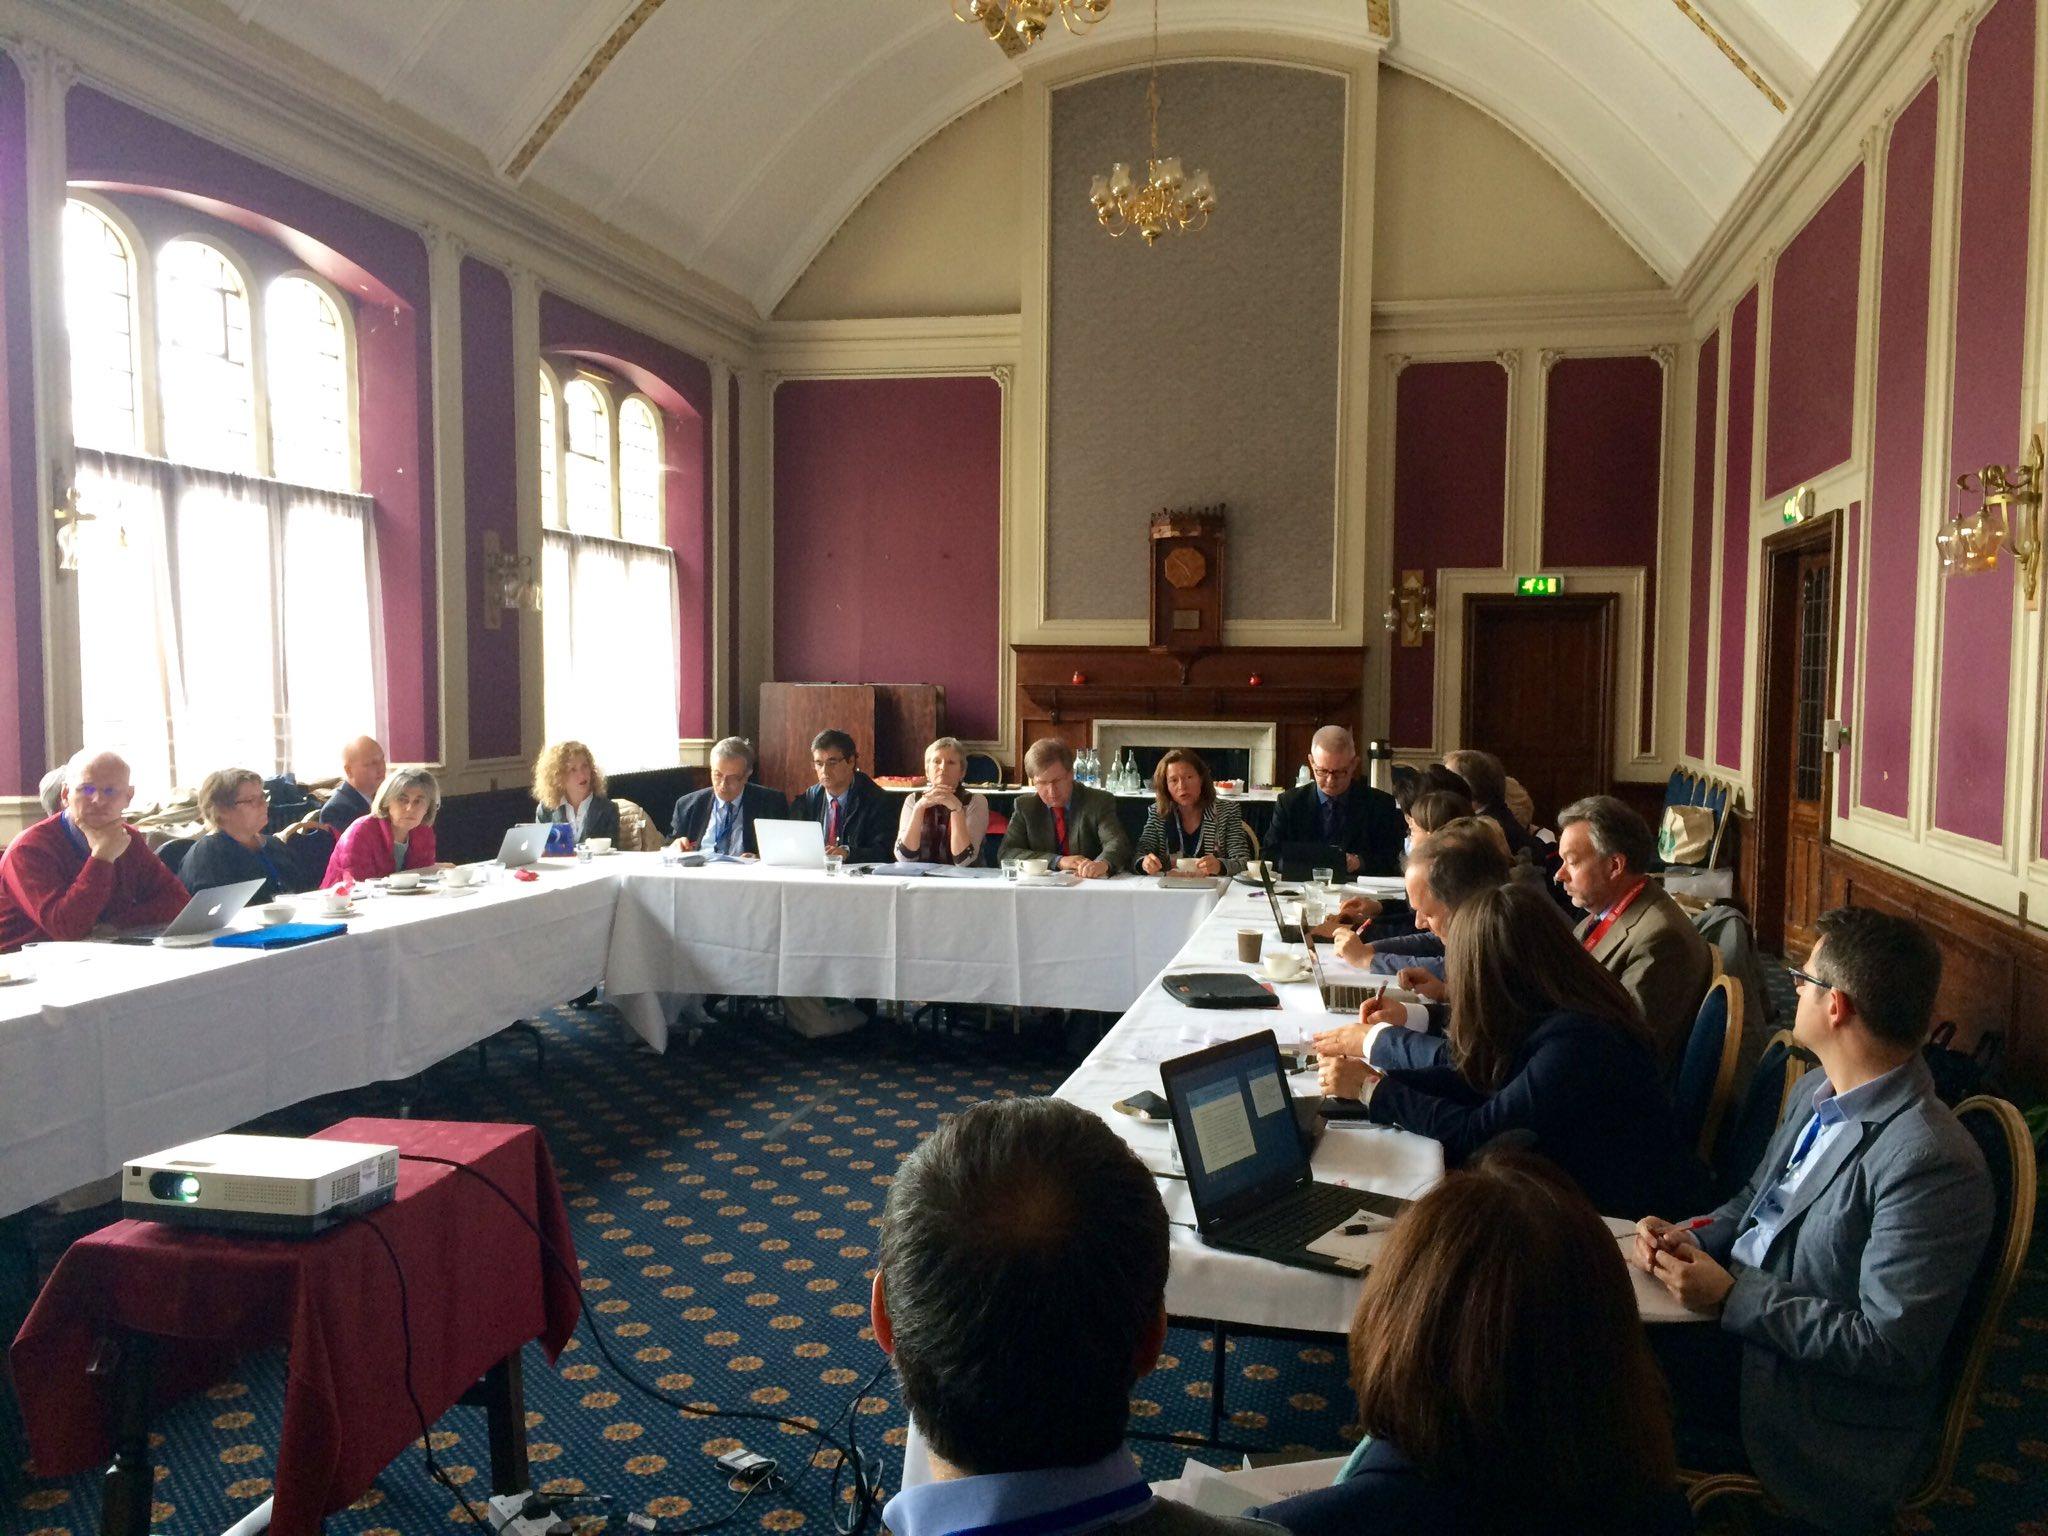 La Universidad de Salamanca participa en la reunión anual del Comité Ejecutivo del Grupo Coimbra de Universidades